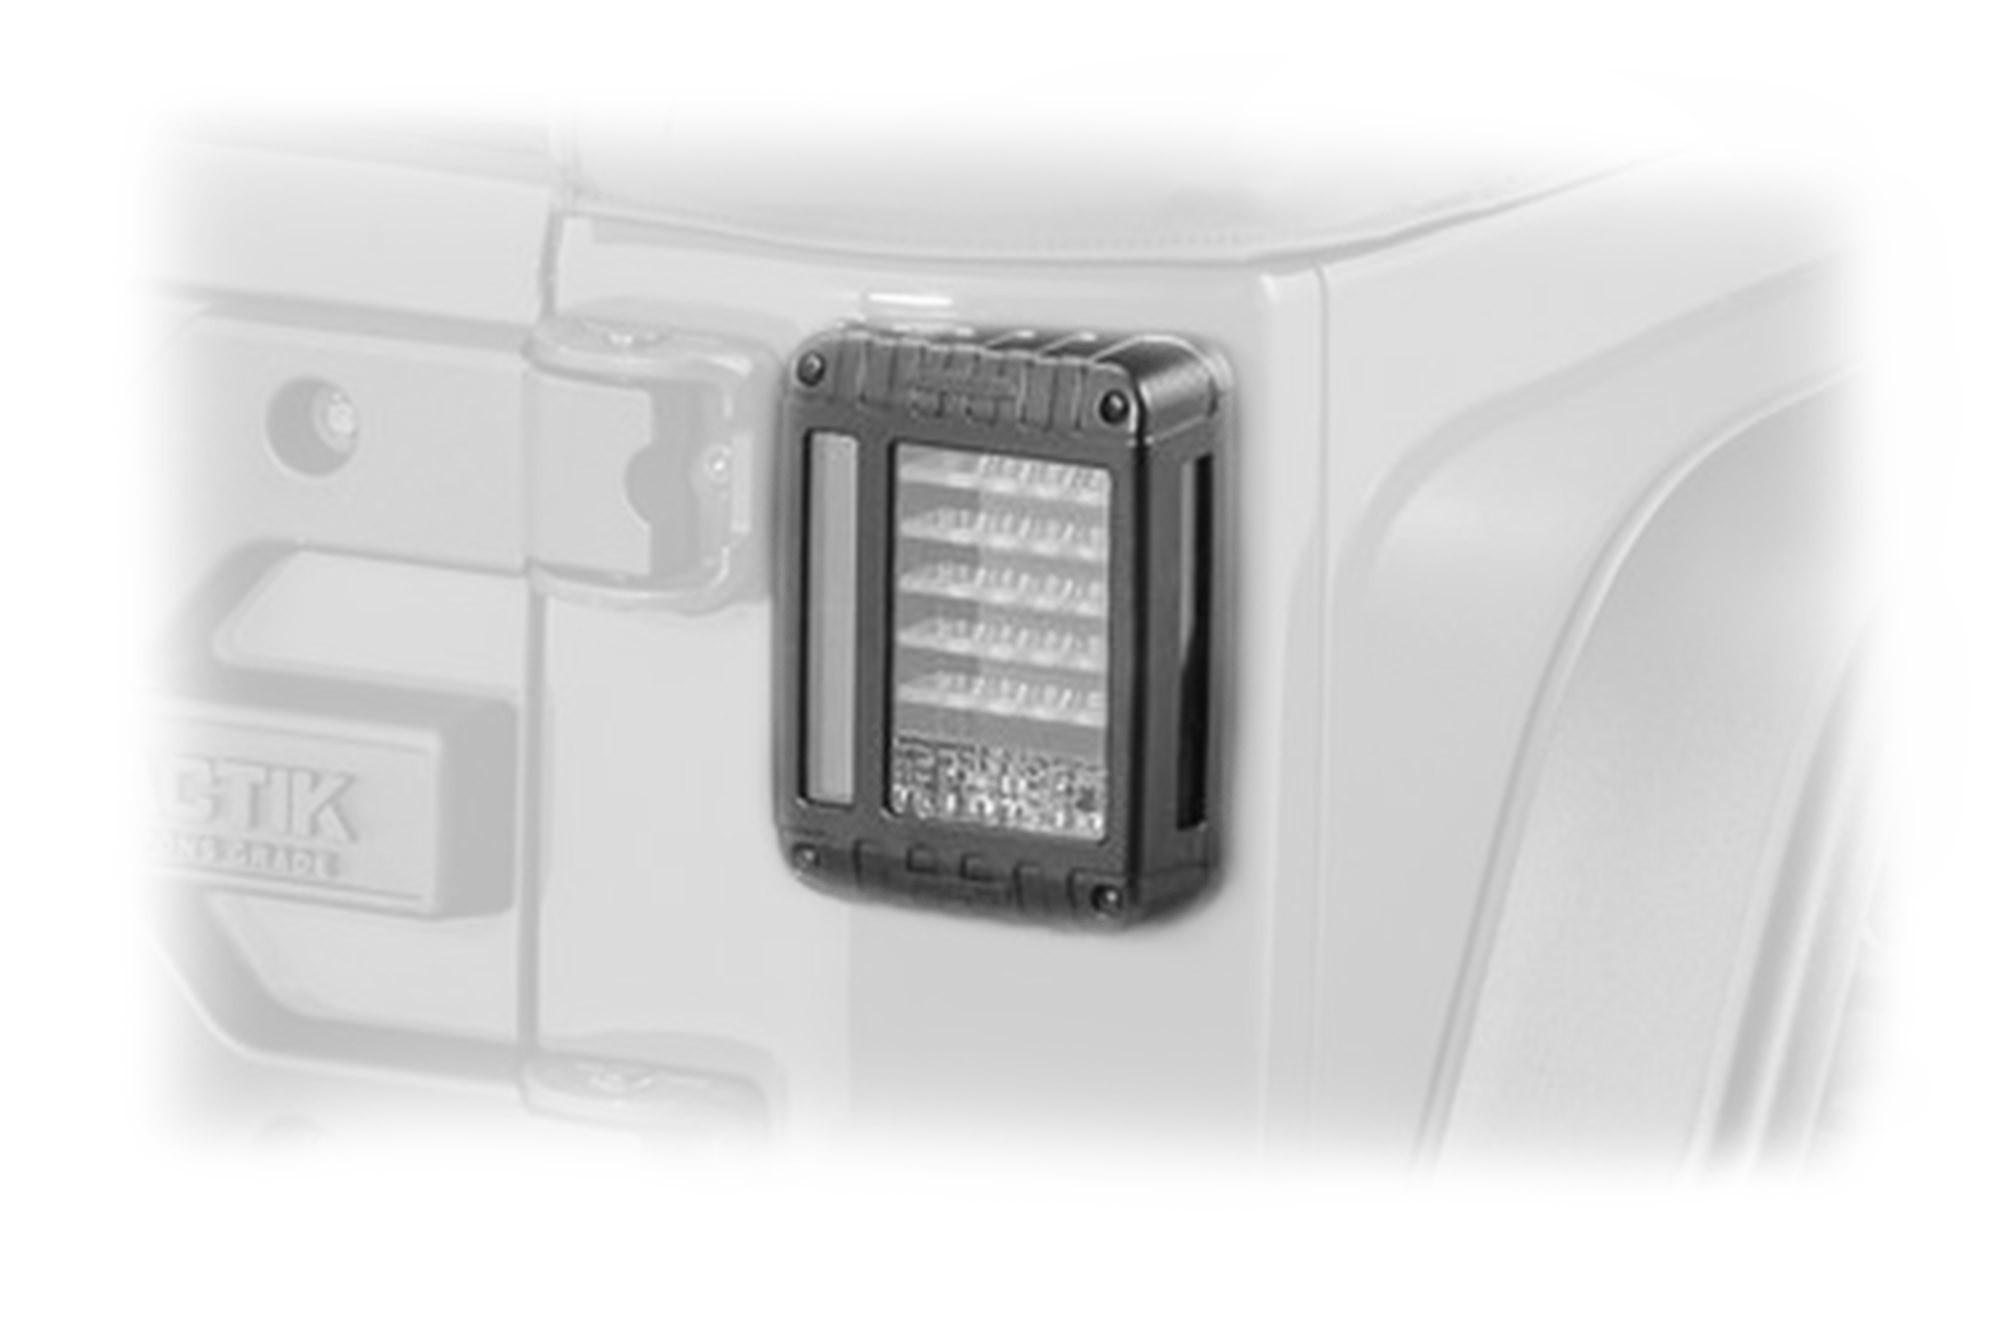 JW Speaker Model 279 J Series LED Tail Lights (Pair) For 2007-18 Jeep Wrangler JK 2 Door & Unlimited 4 Door Models